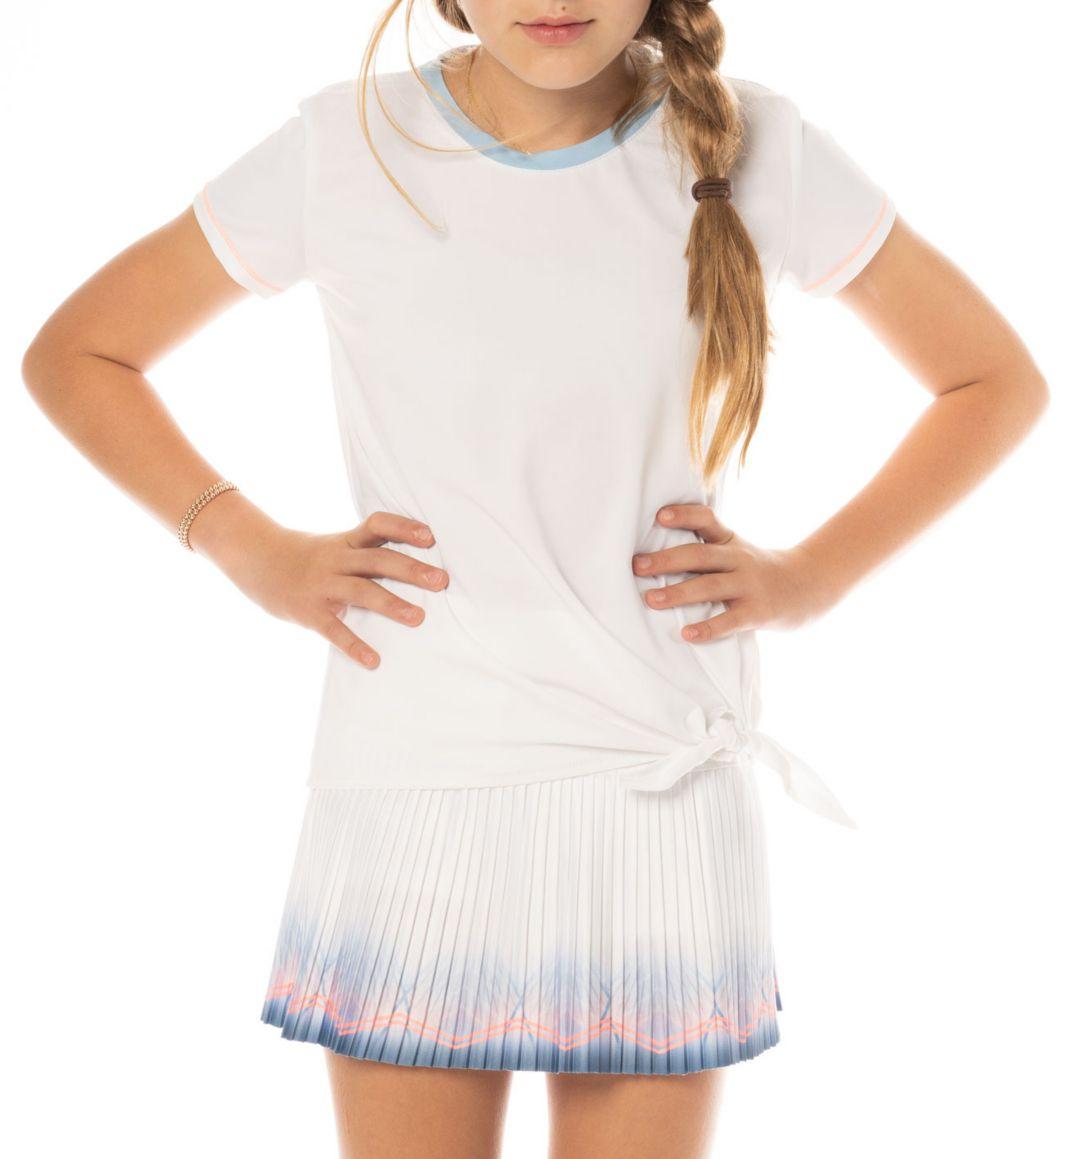 premium selection 80a71 27b2b Lucky In Love Girls' Tie Knot Tennis Shirt